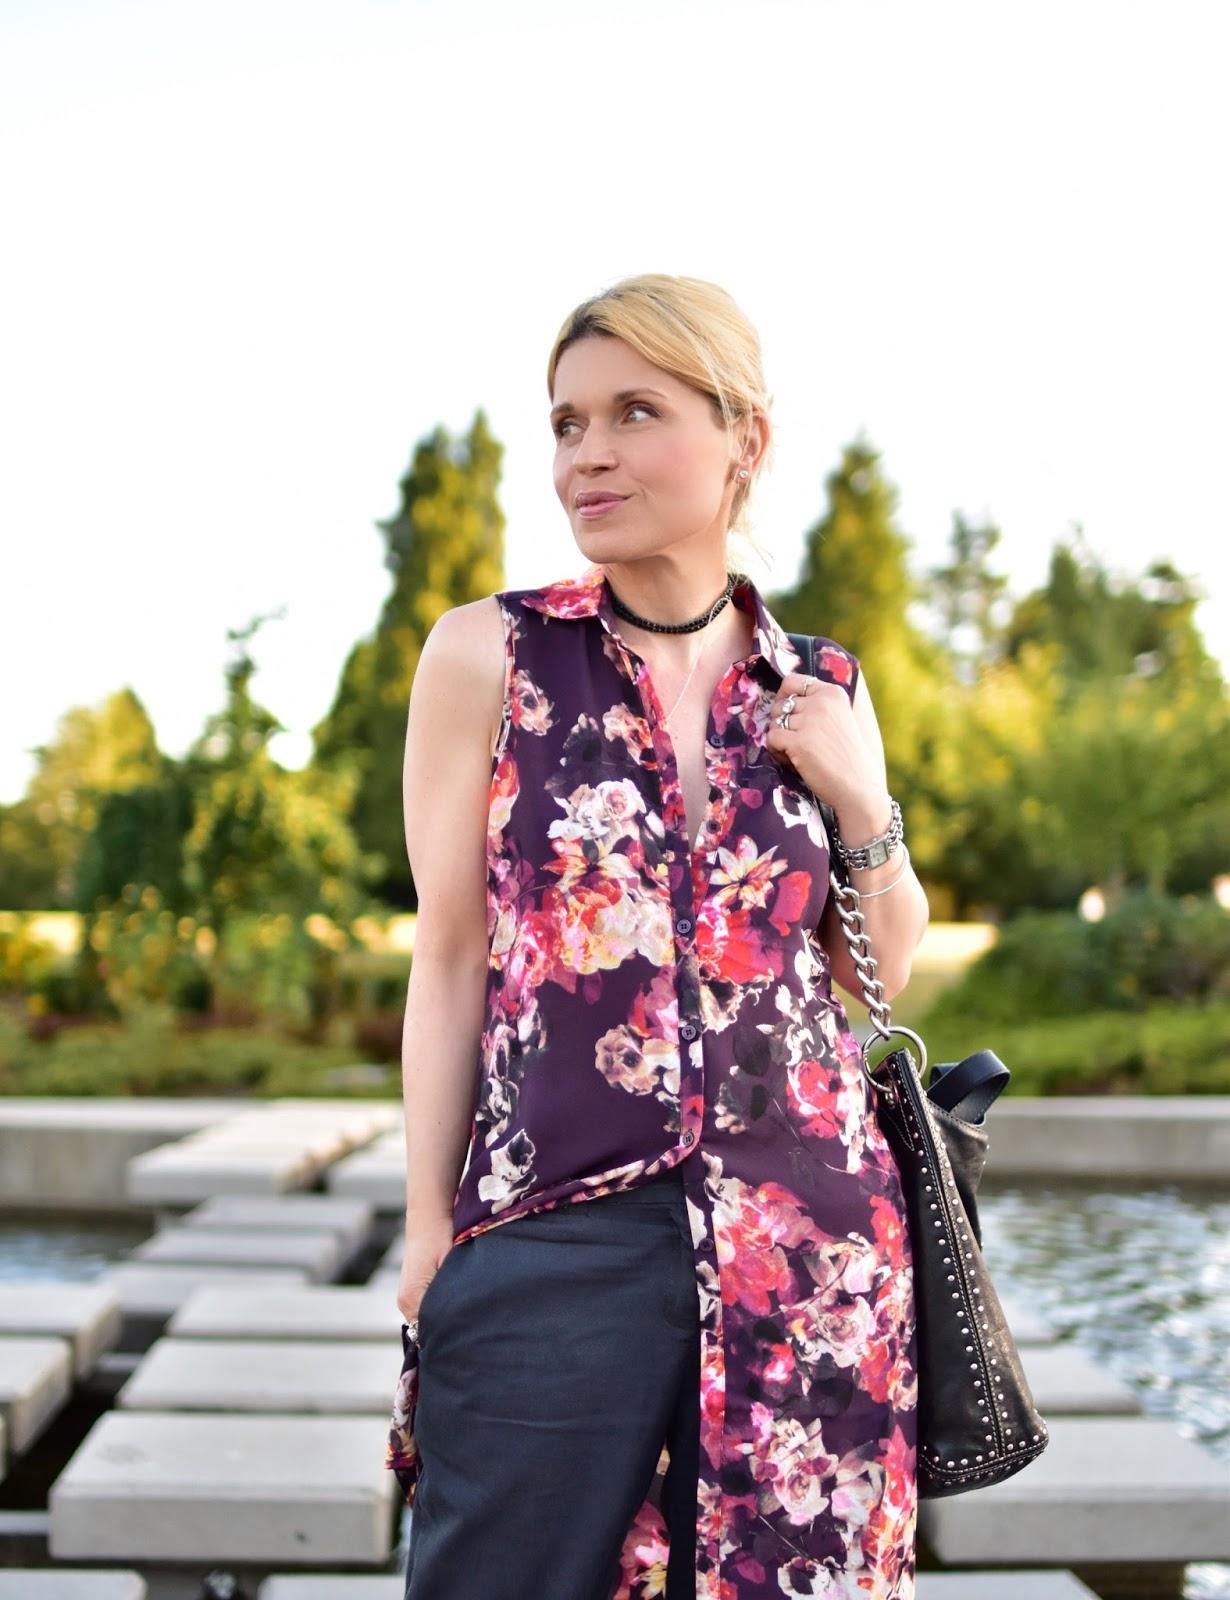 floral tunic-style blouse, boyfriend trousers, MK bag